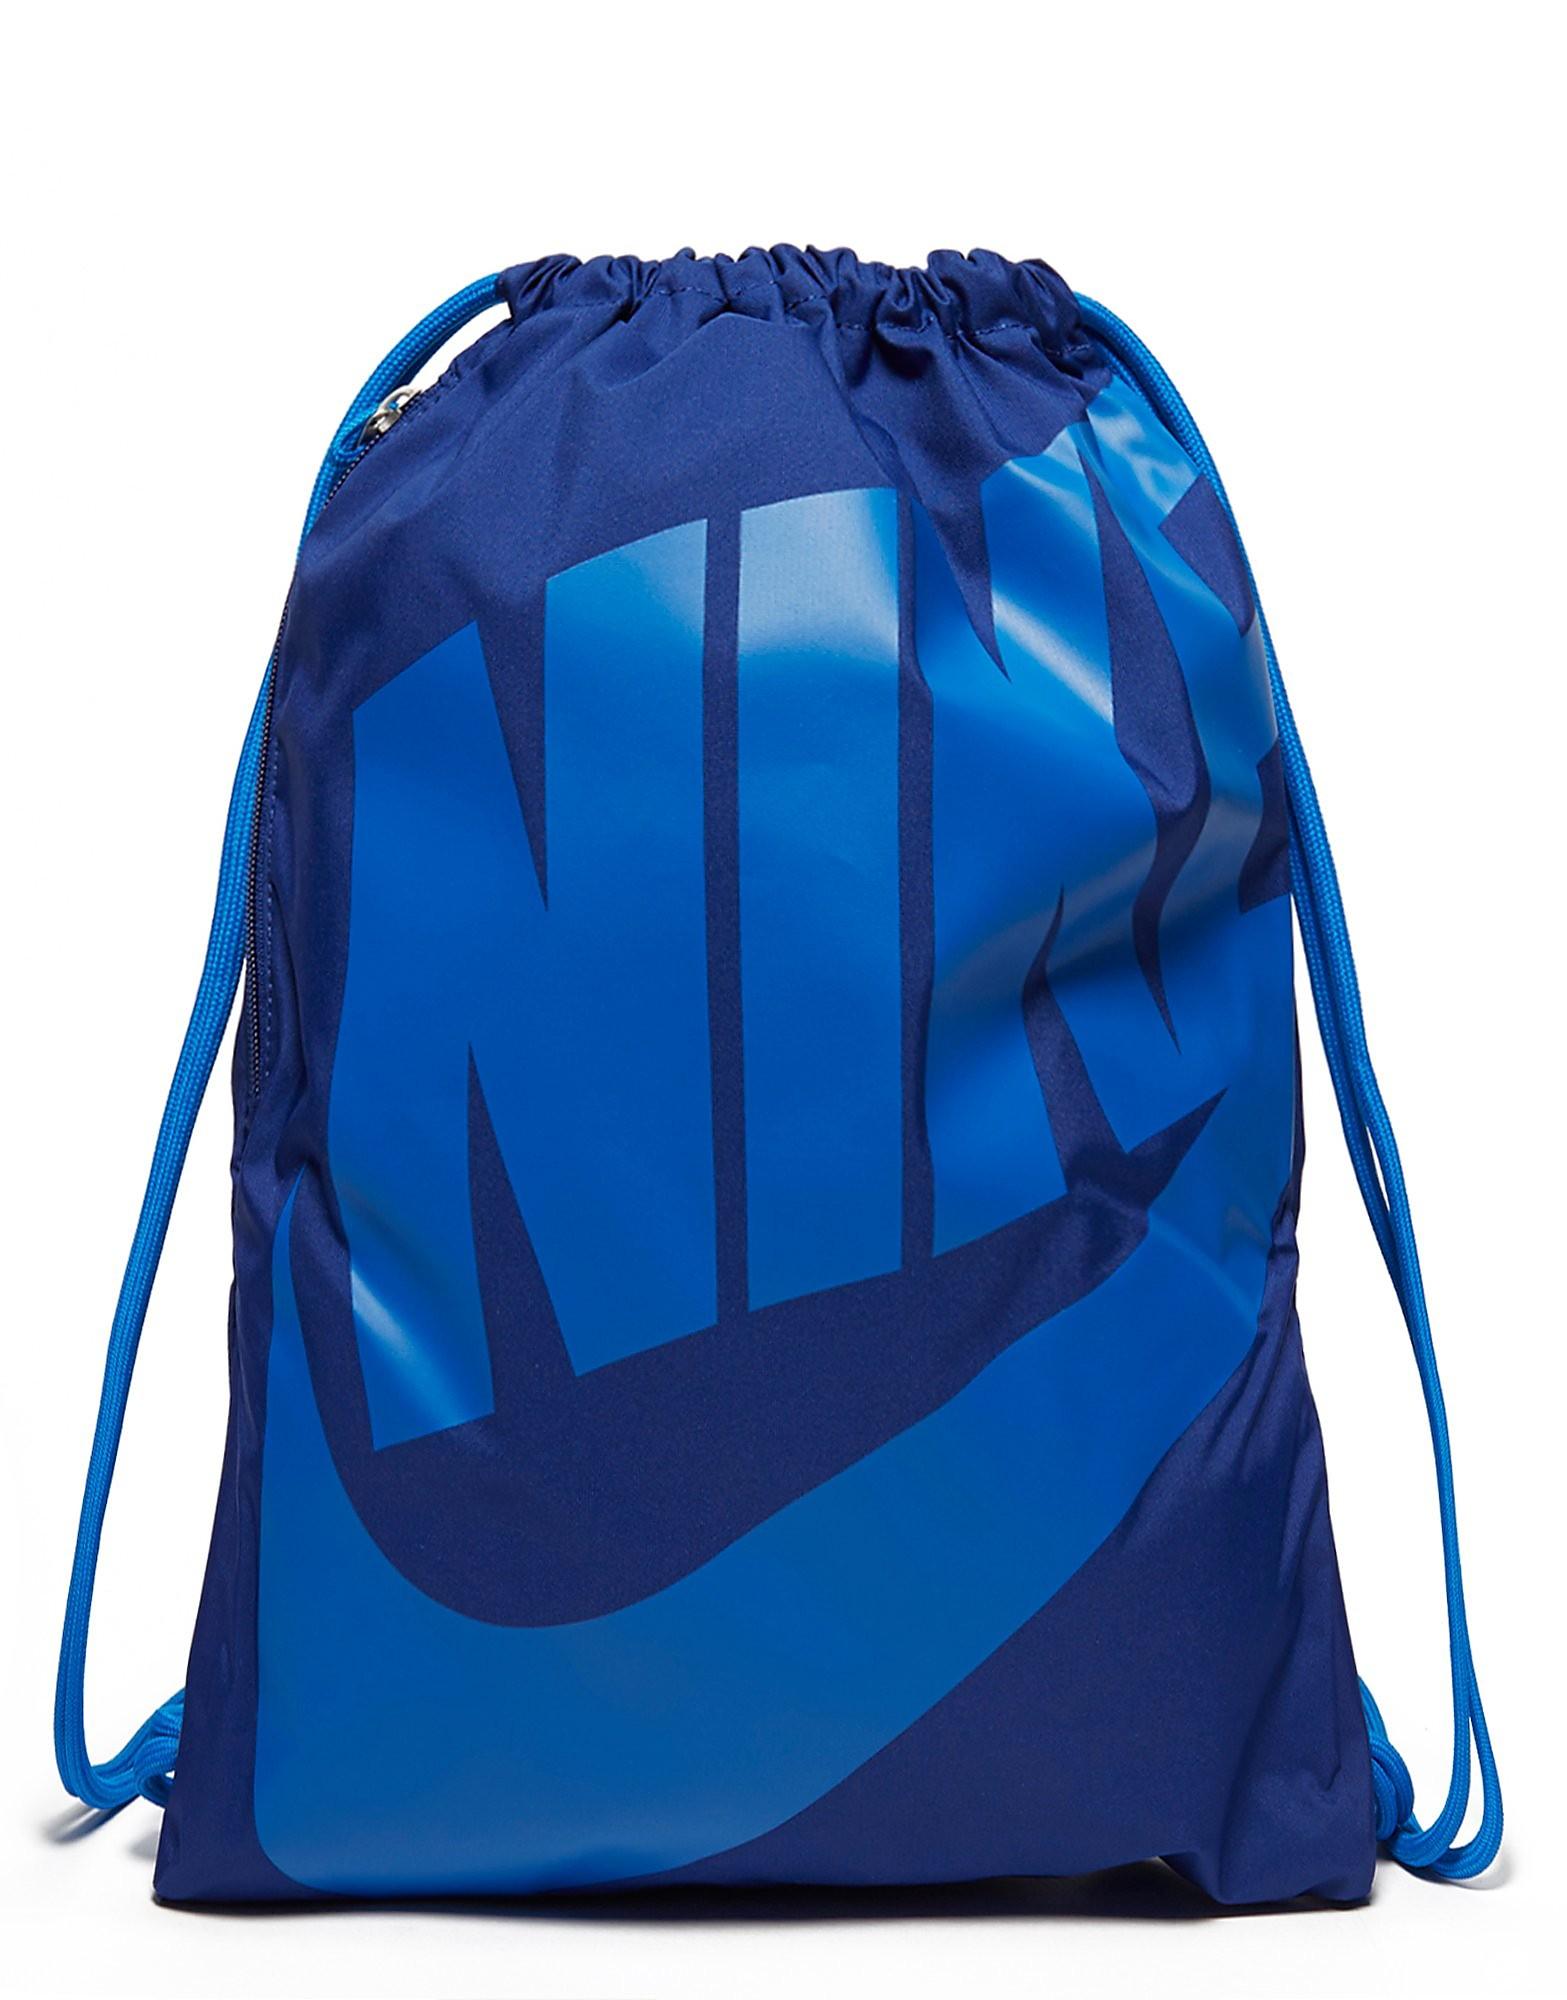 Nike Heritage Gymsack - Royal Blue - Mens, Royal Blue